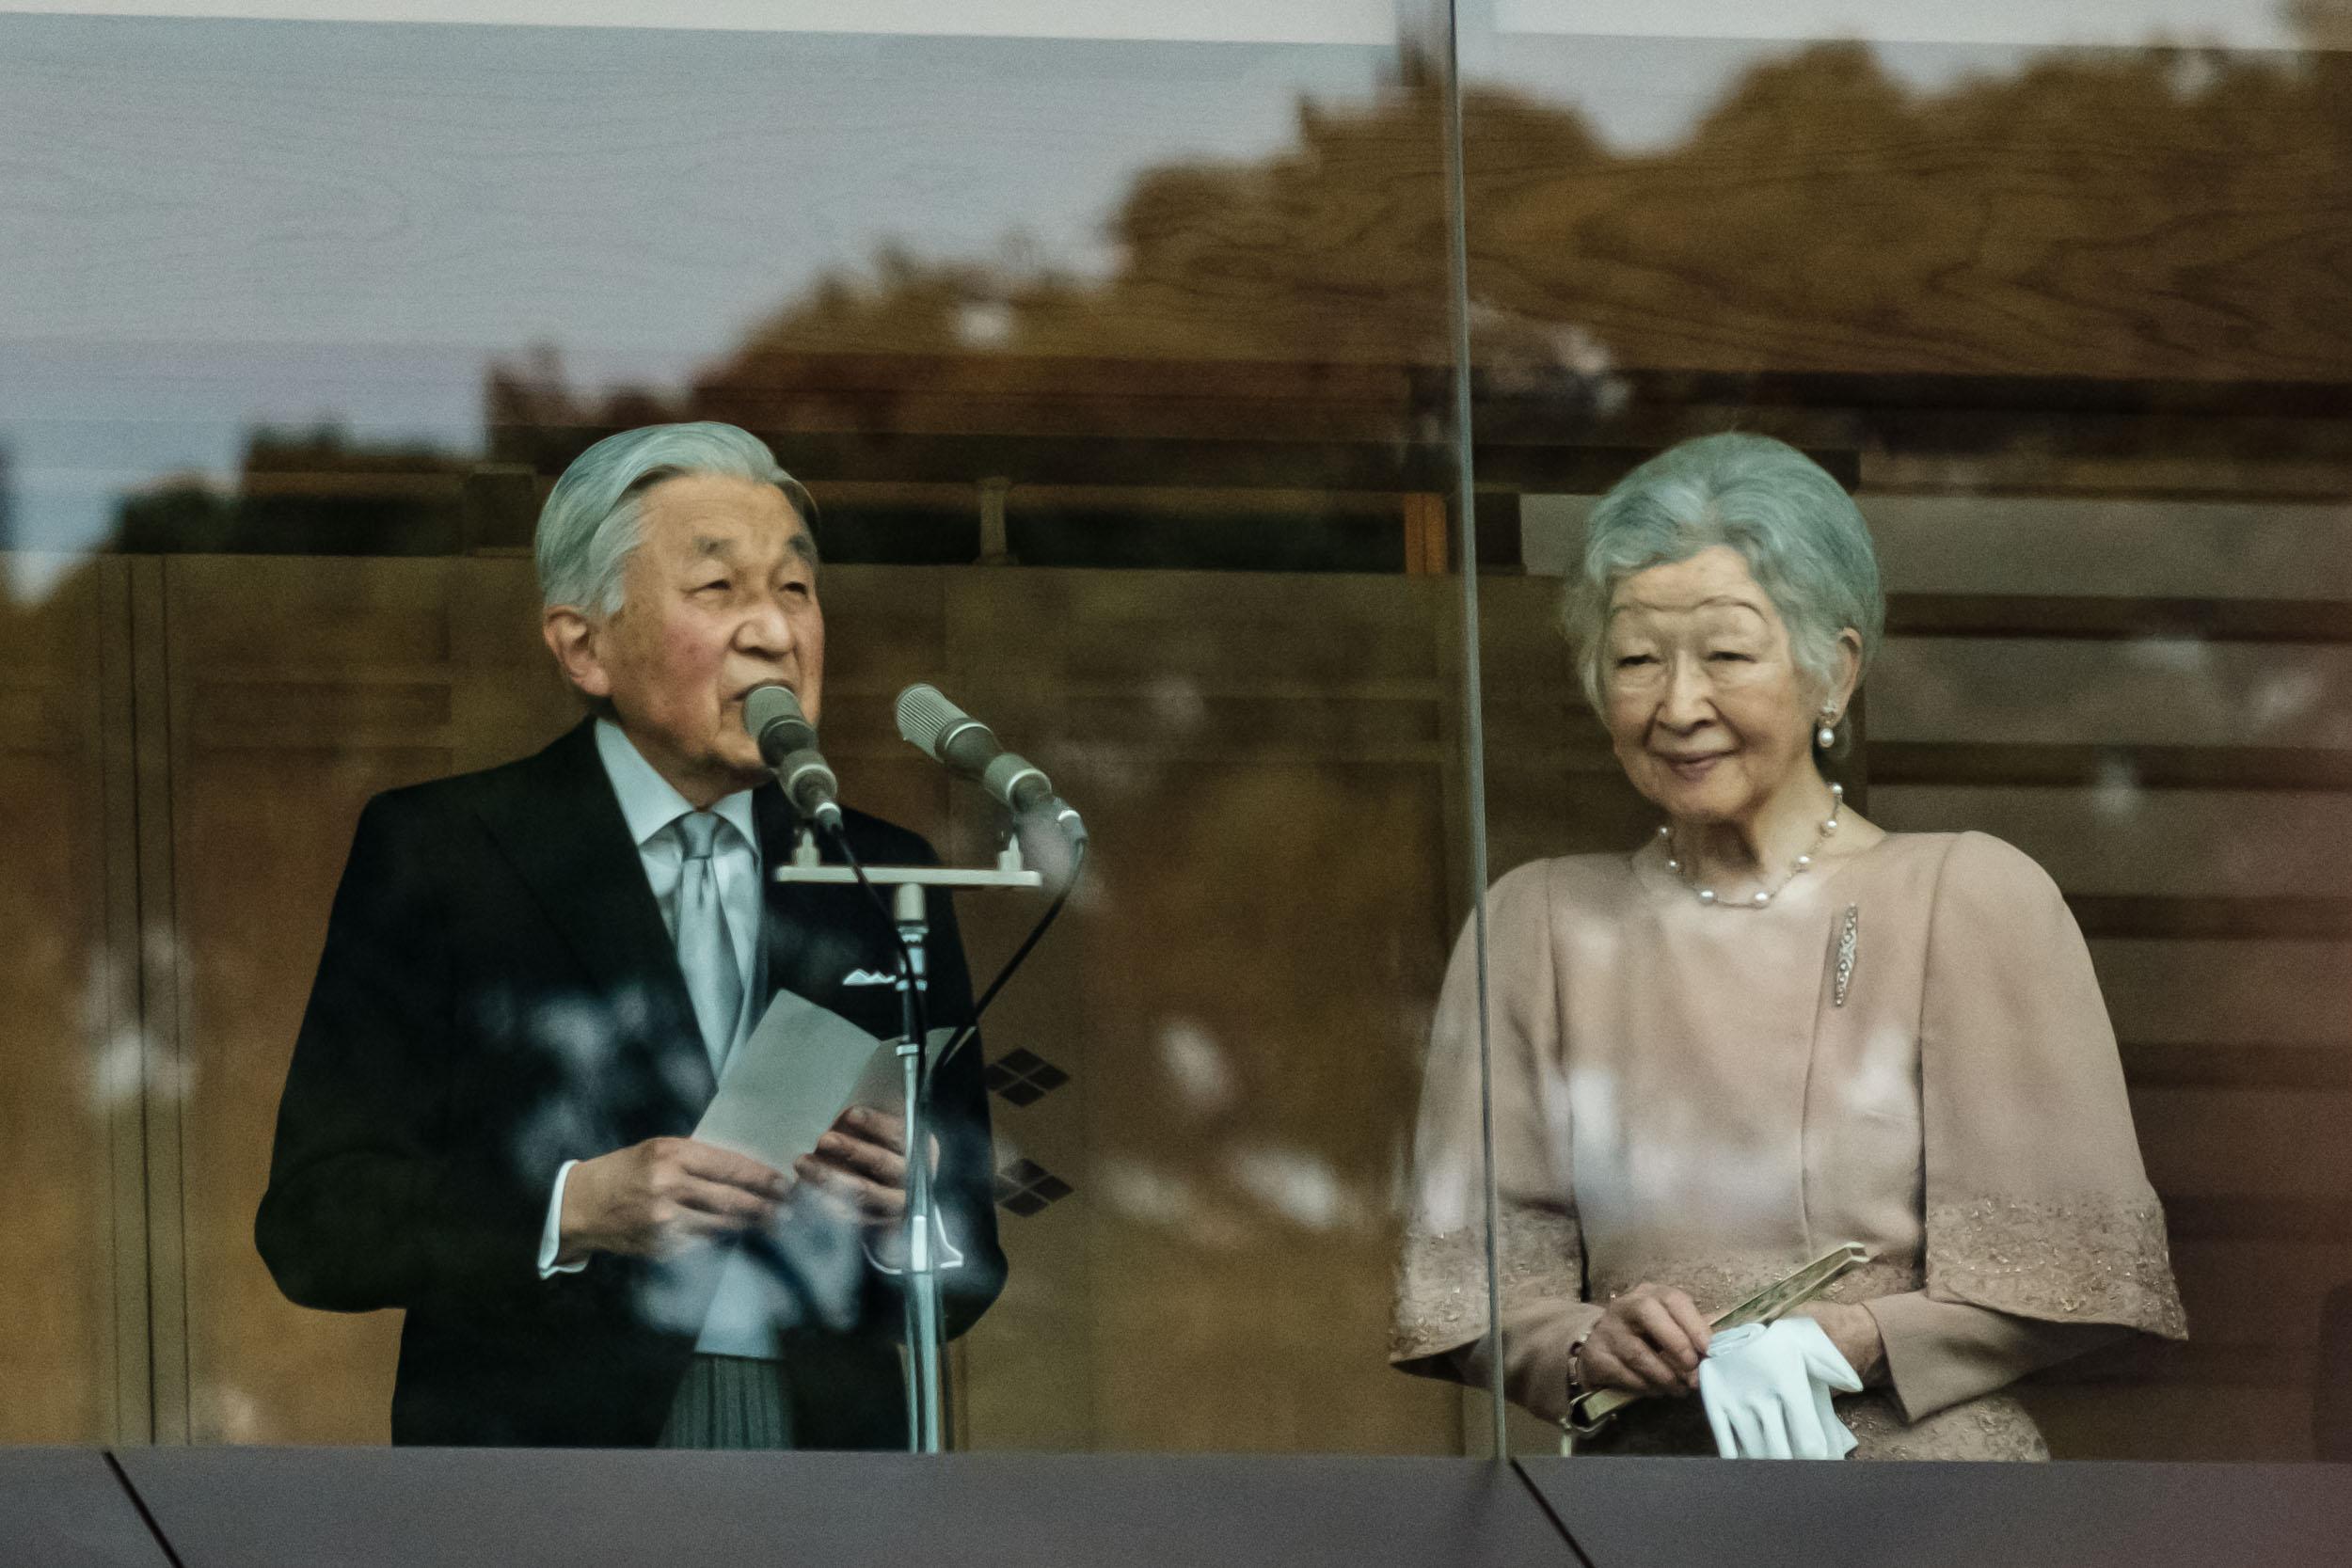 Emperor Akihito making his speech while Empress Michiko looks upon